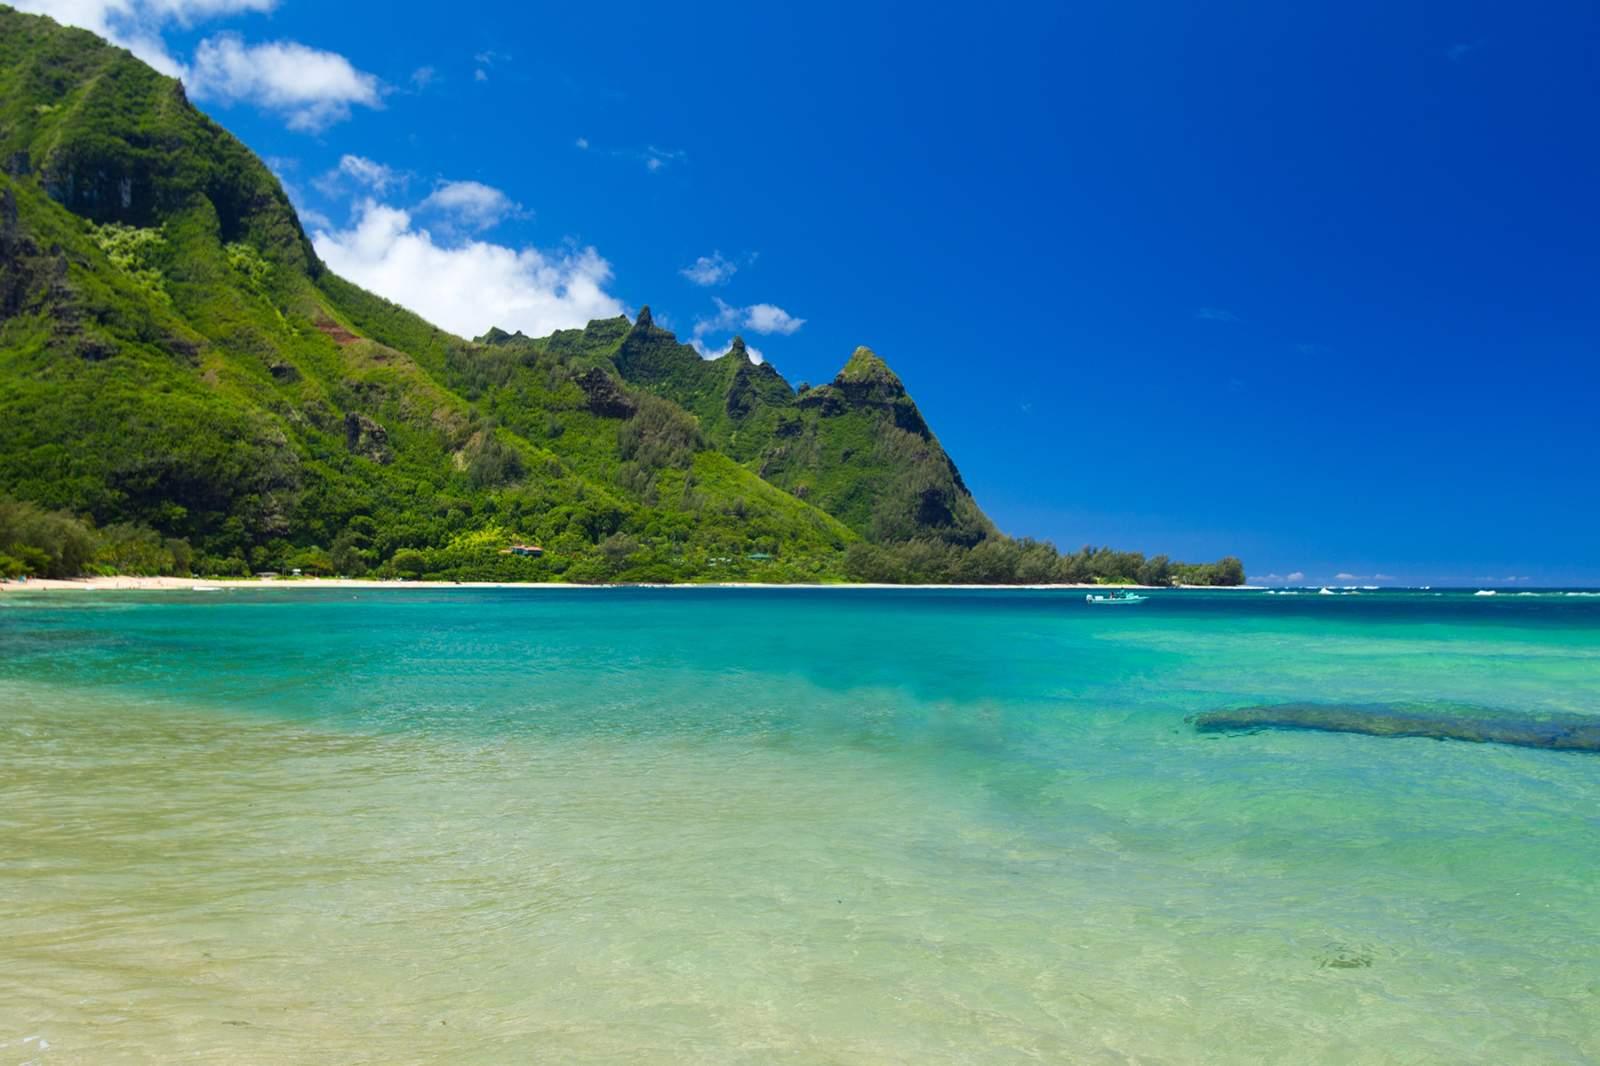 Kauai - Hanalei Bay